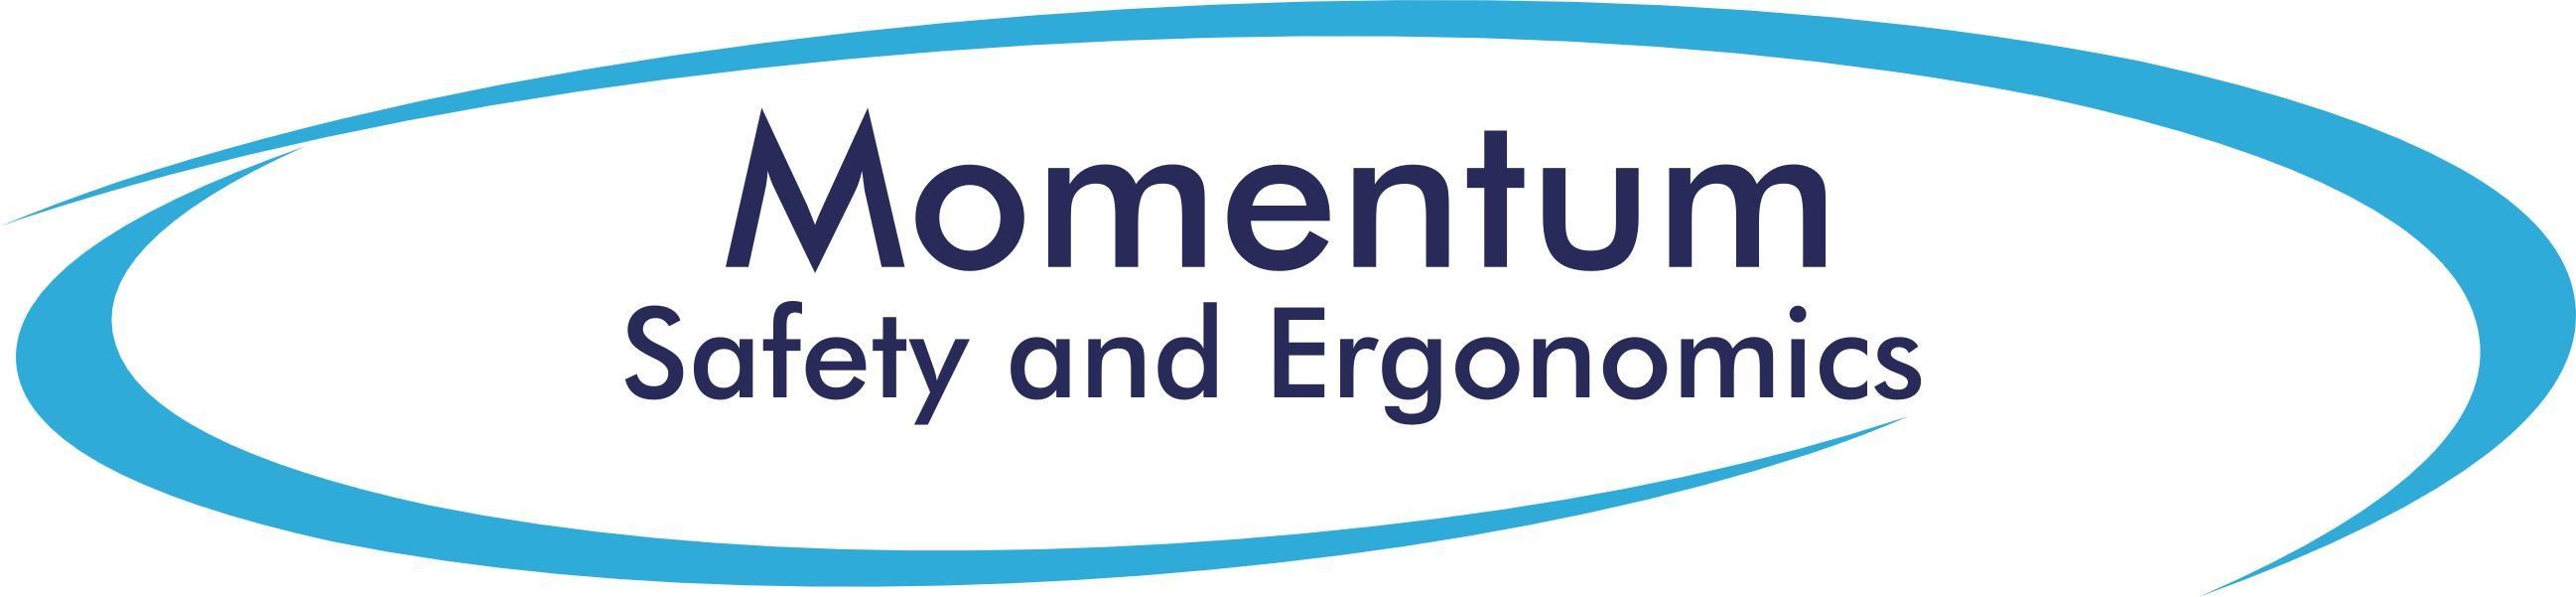 momentum safety logo